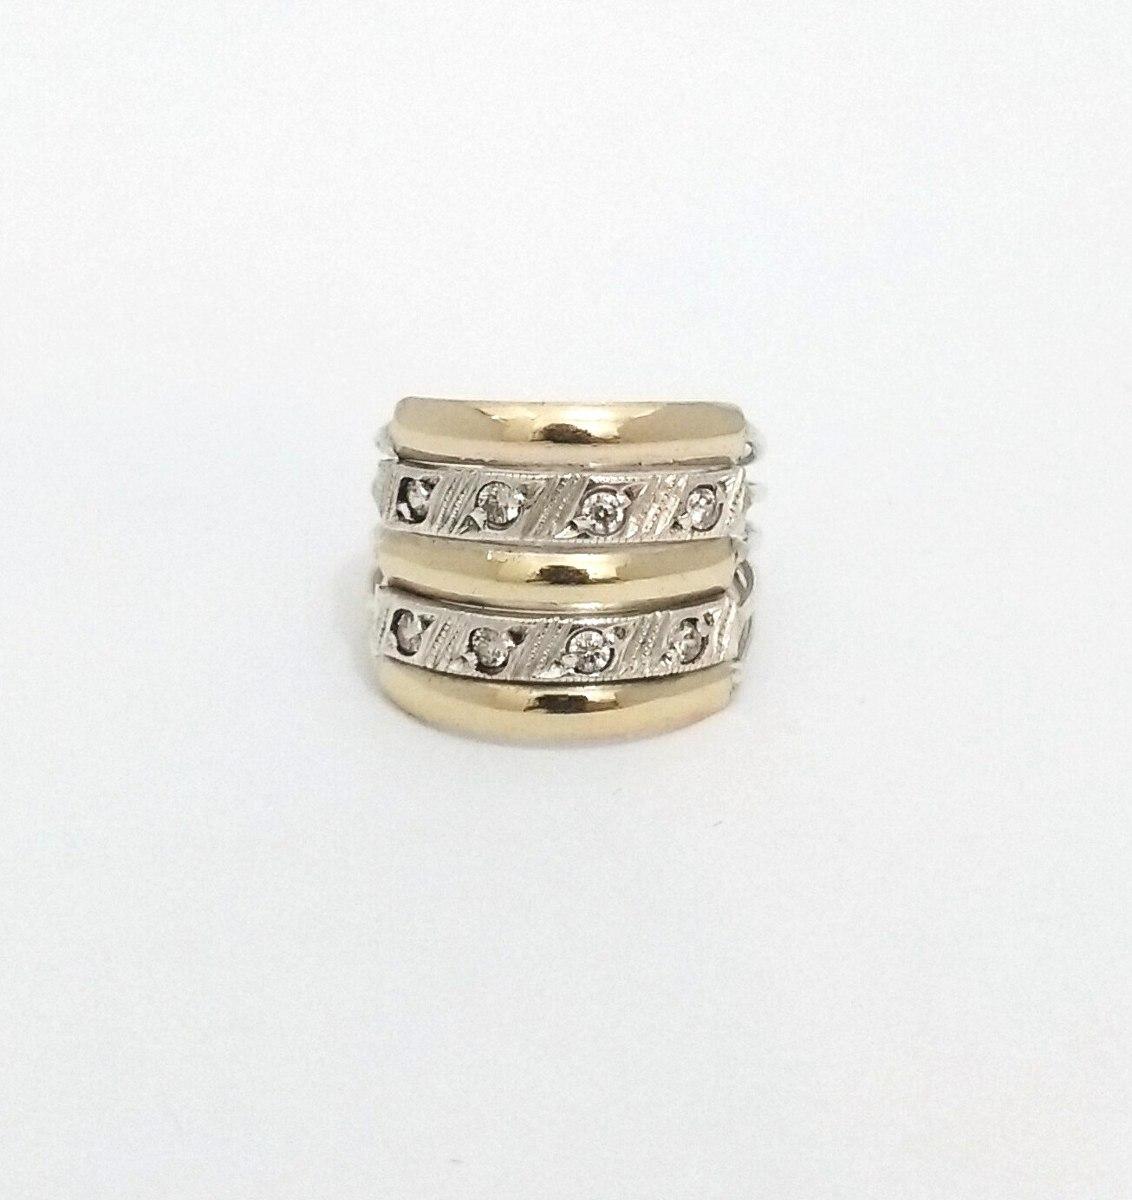 596b46f517663 Anel elos feminino status jóia top luxo prata ouro barato jpg 1132x1200 Ouro  anel de prata